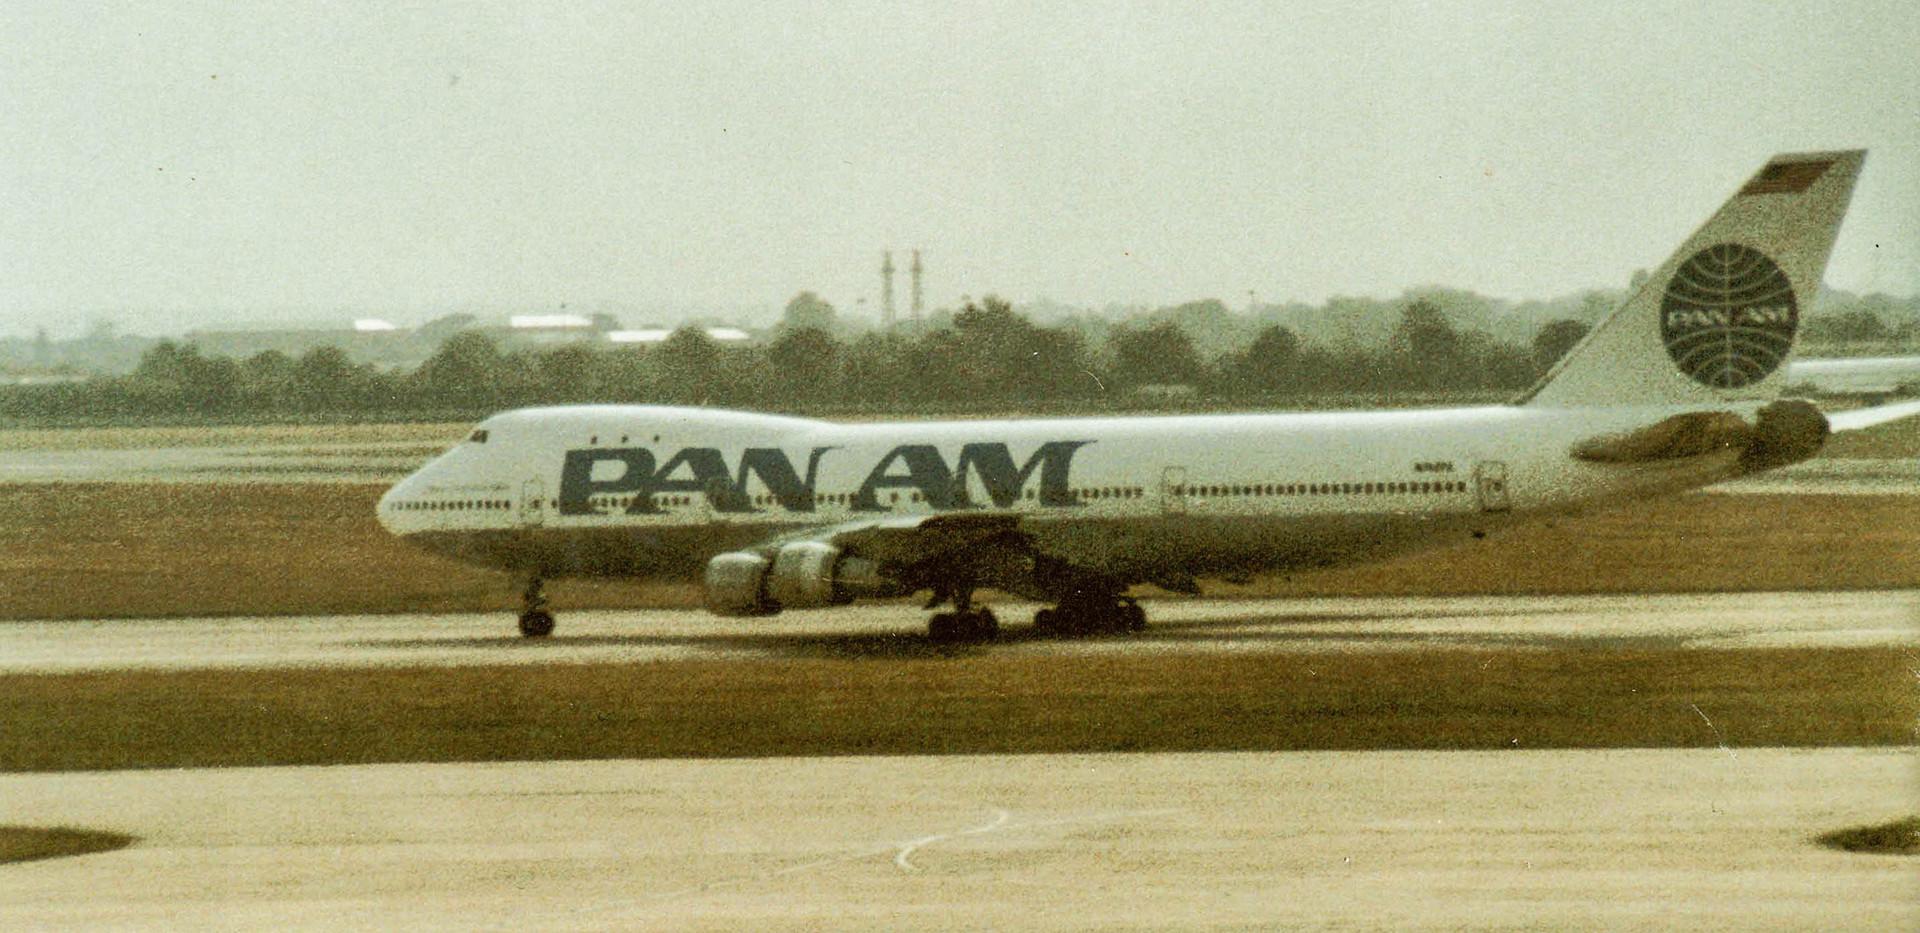 pan-am-747-1990s_24352361797_o.jpg